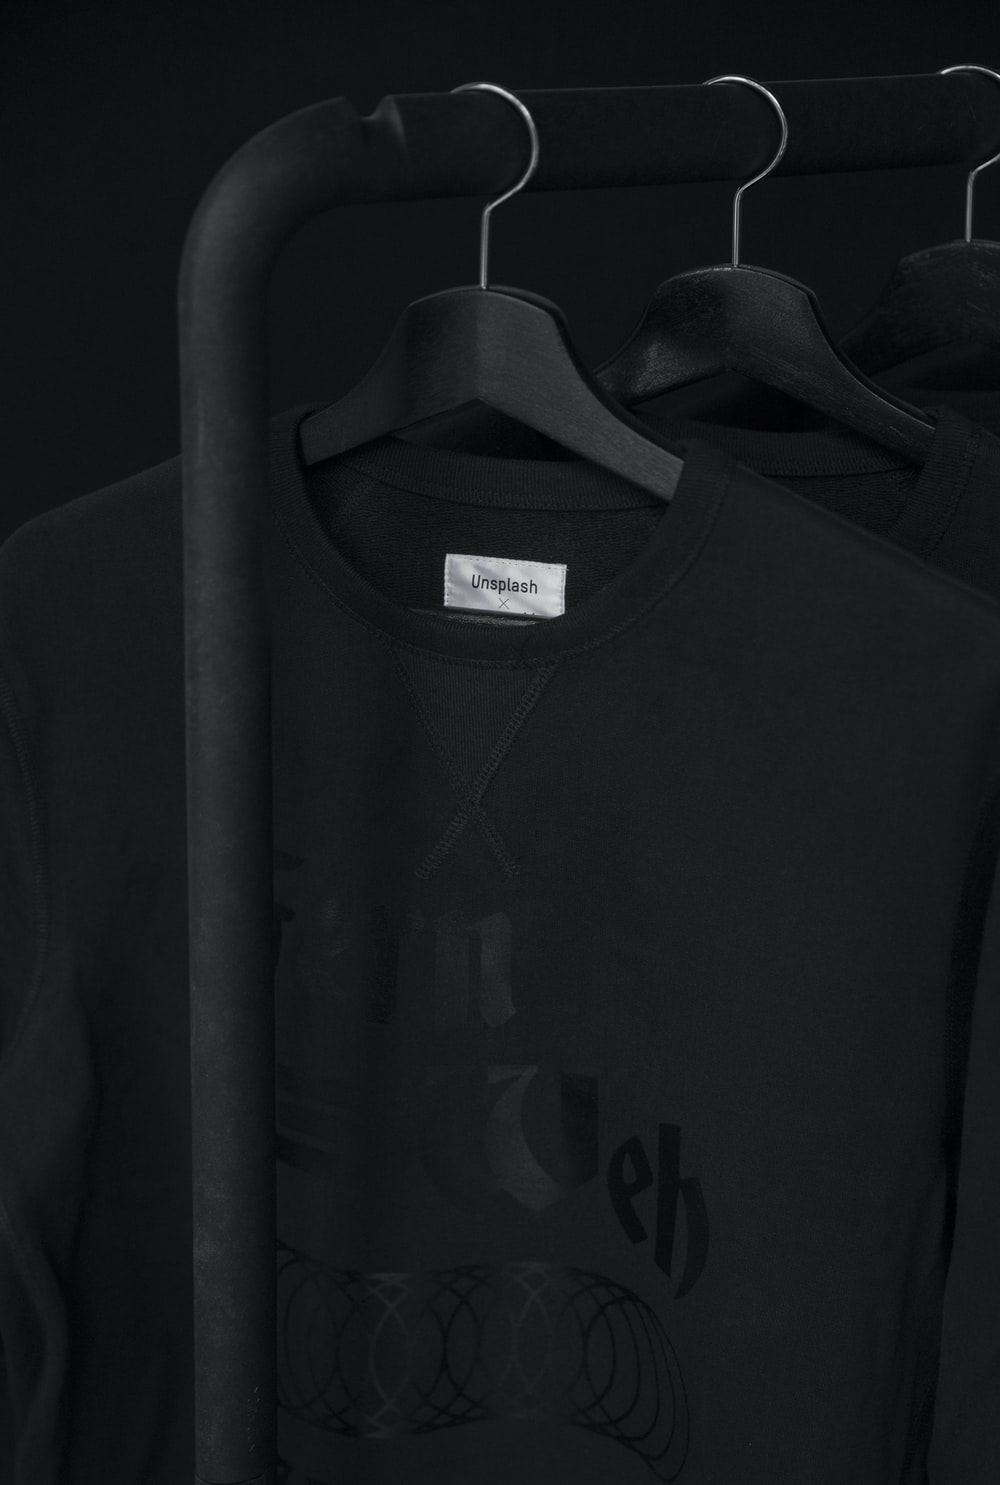 black crew-neck t-shirt on clothes hanger